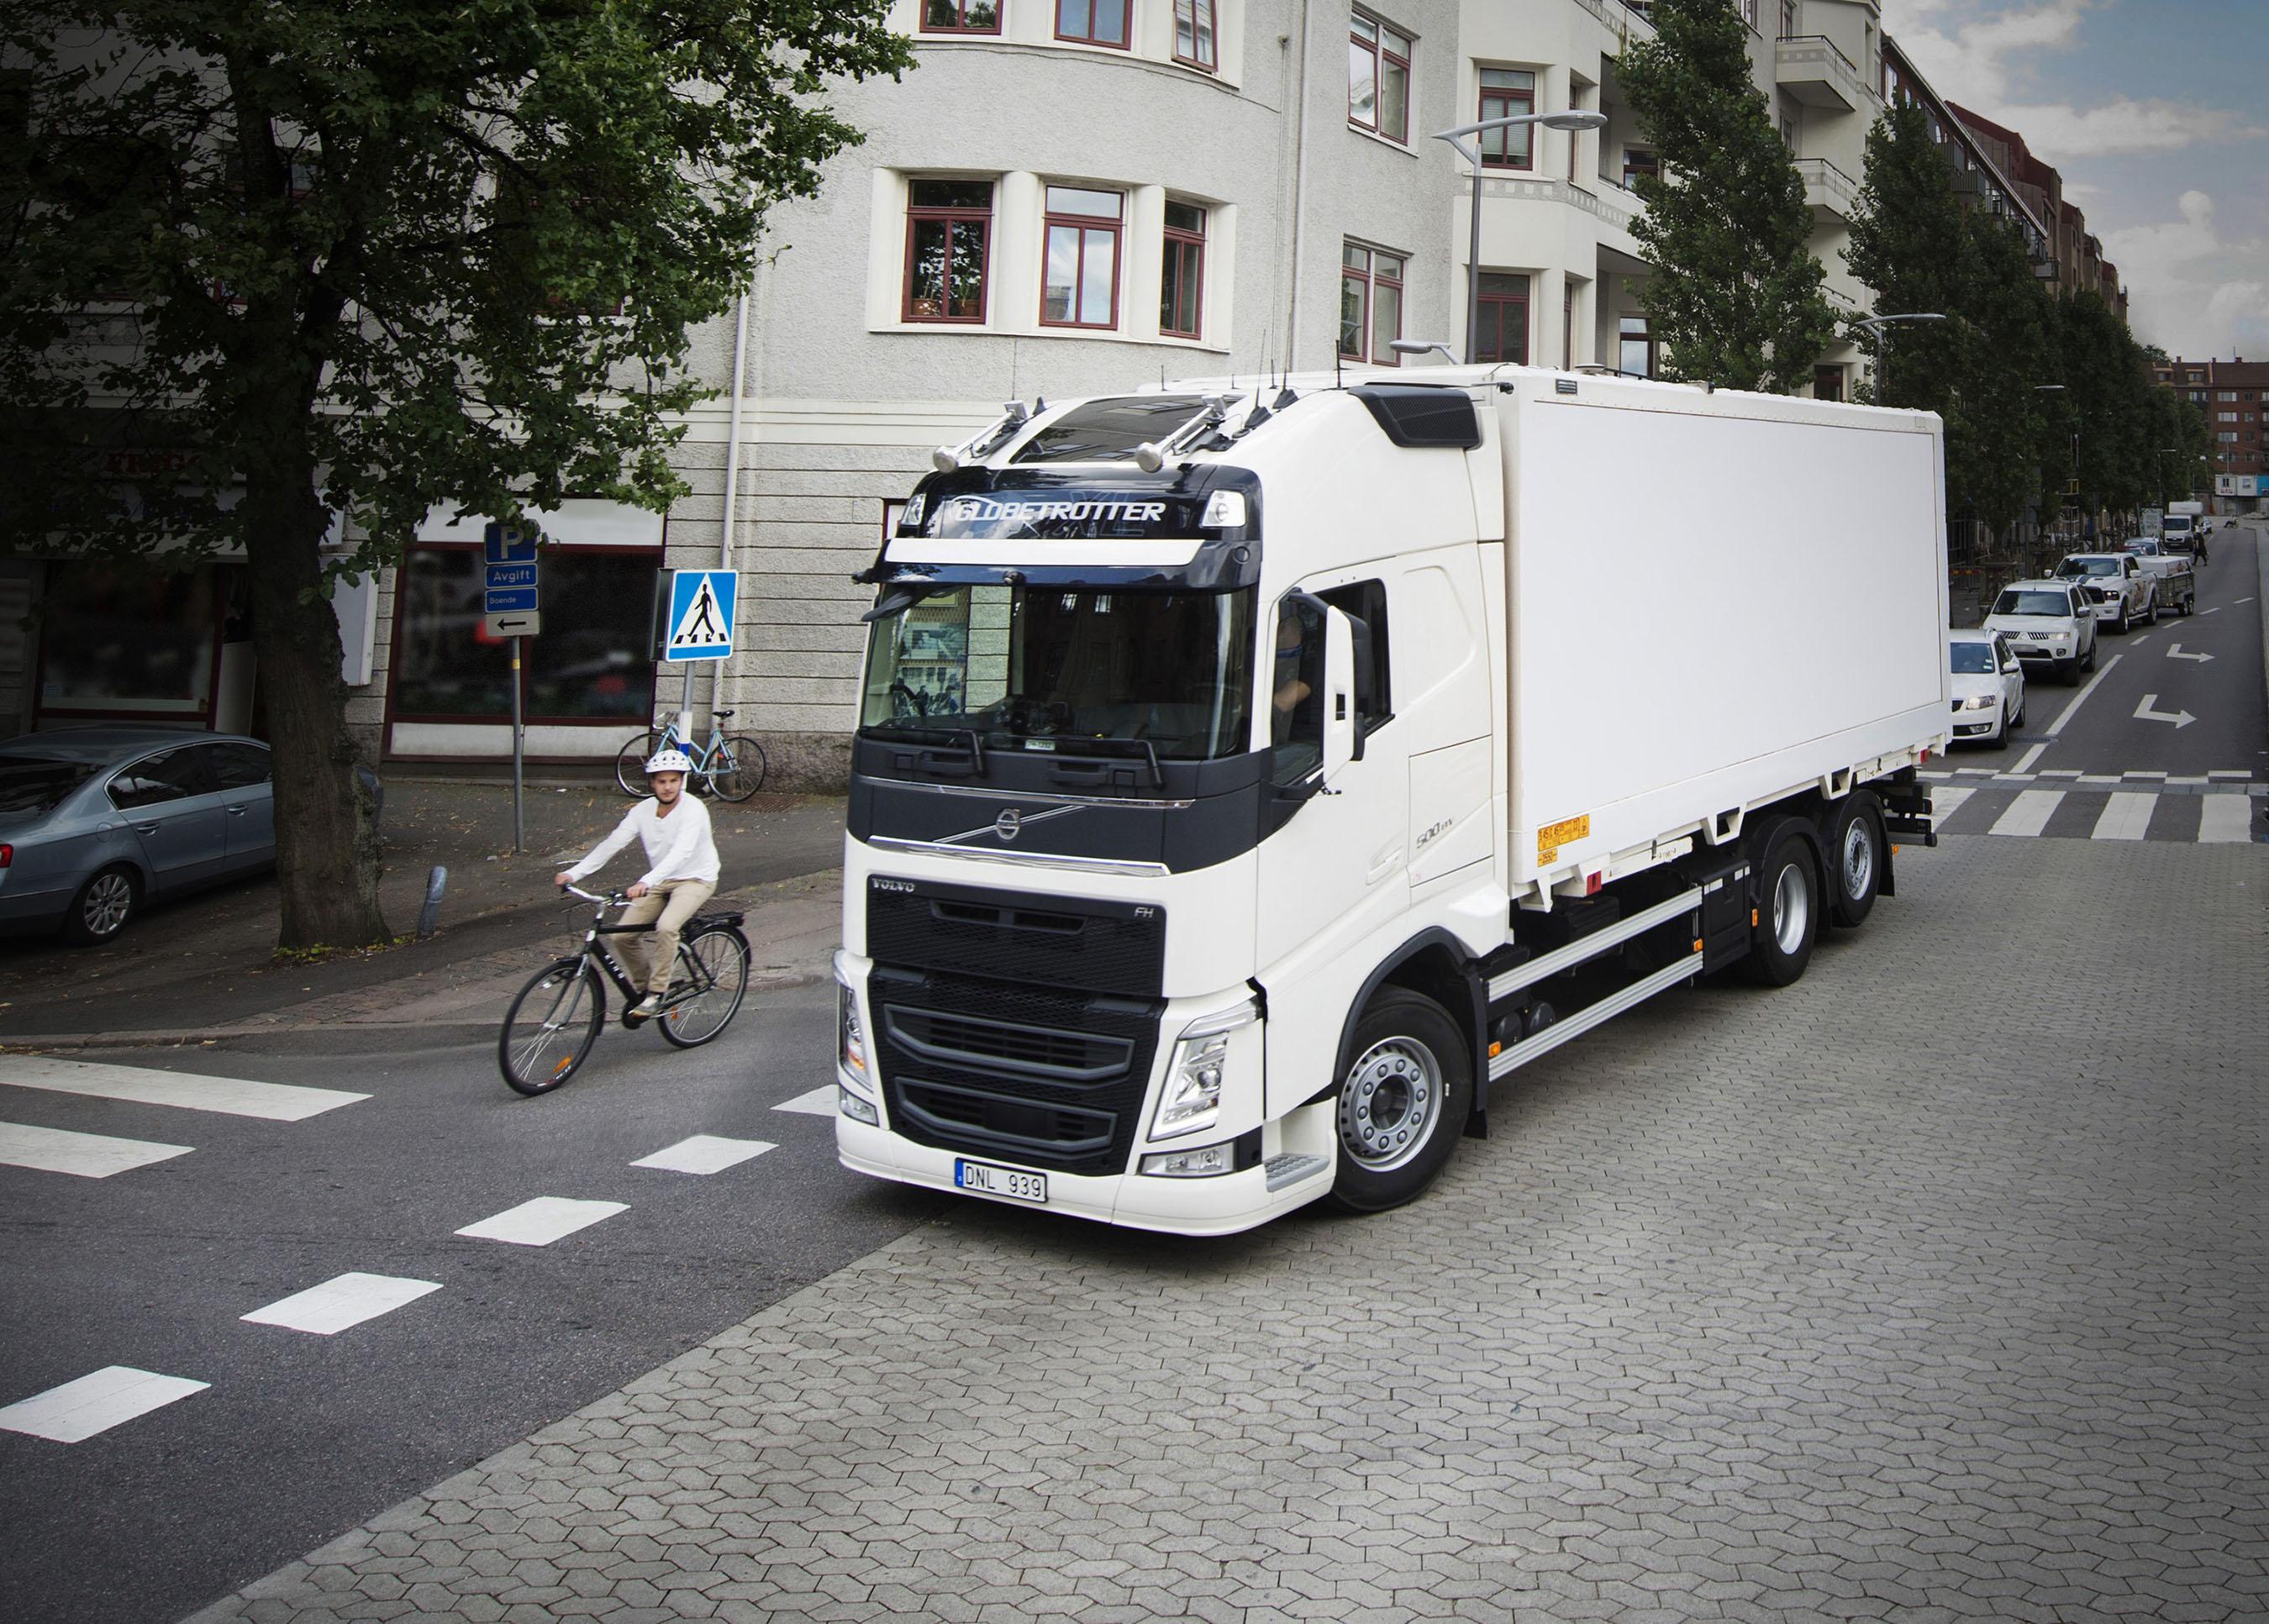 2017 volvo trucks safety report focuses on vulnerable road. Black Bedroom Furniture Sets. Home Design Ideas